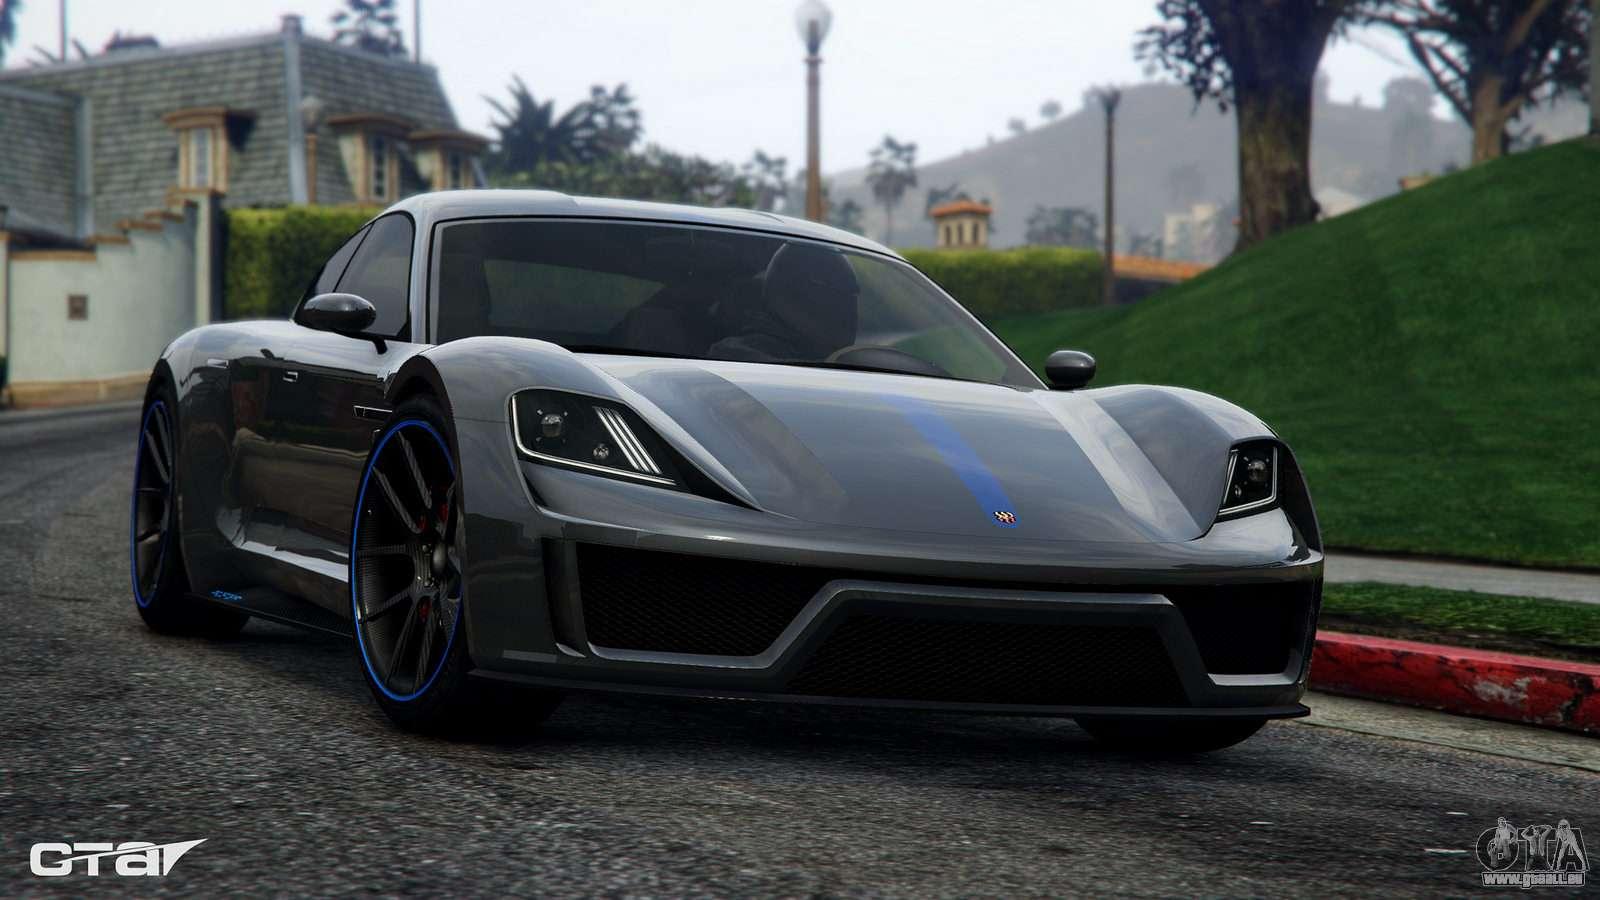 Neues Auto In Gta Online